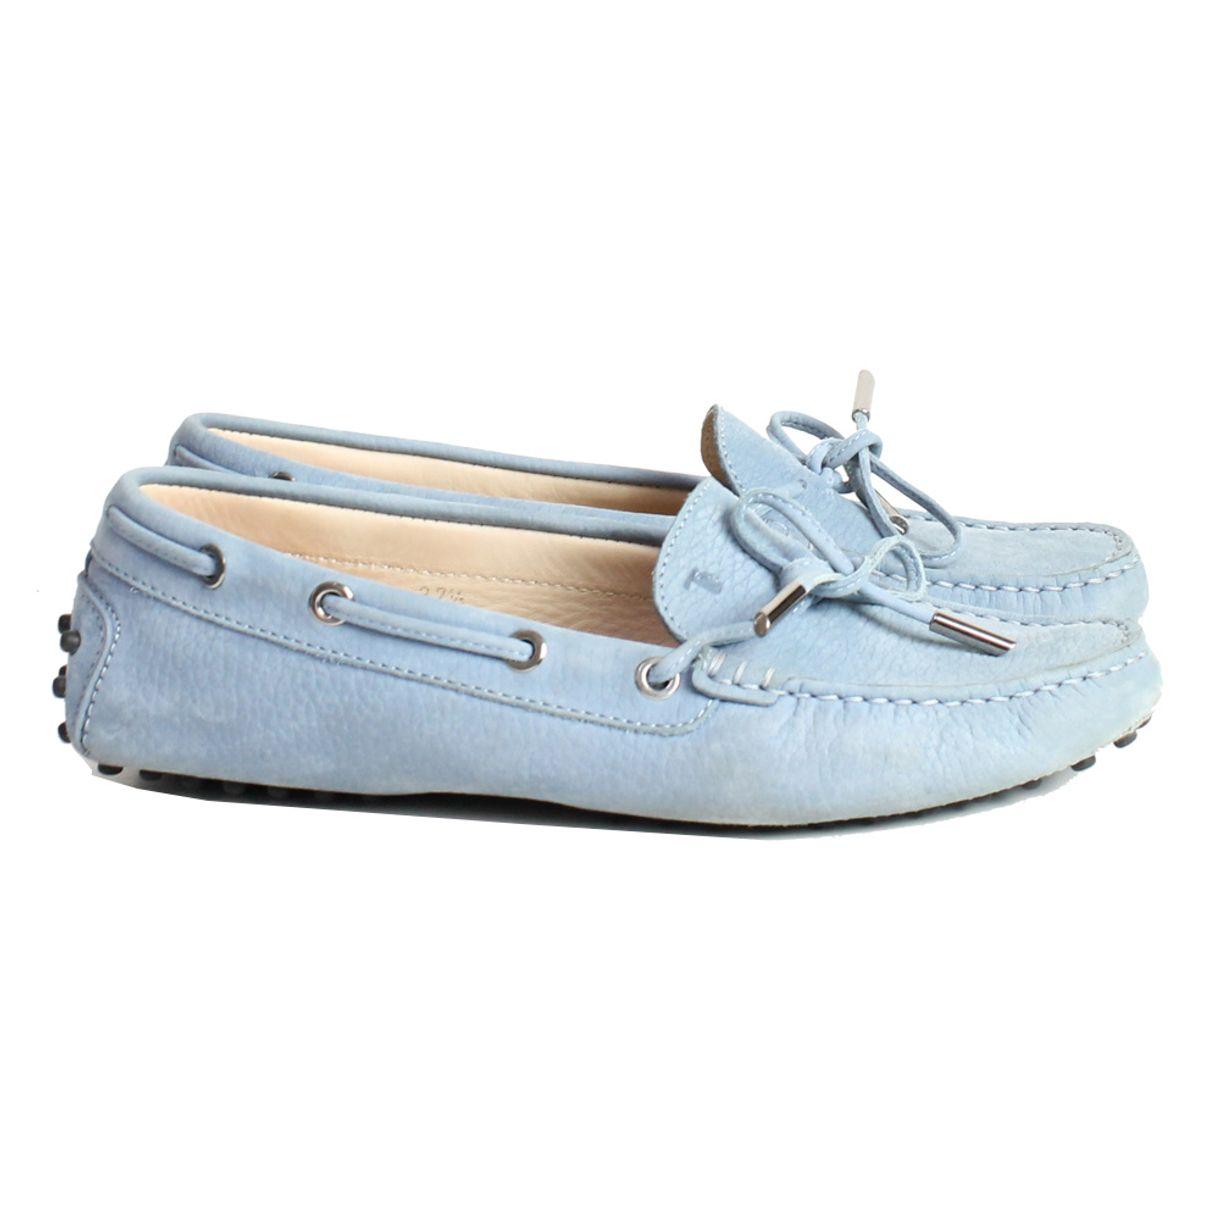 loafer-tods-camurca-azul-claro